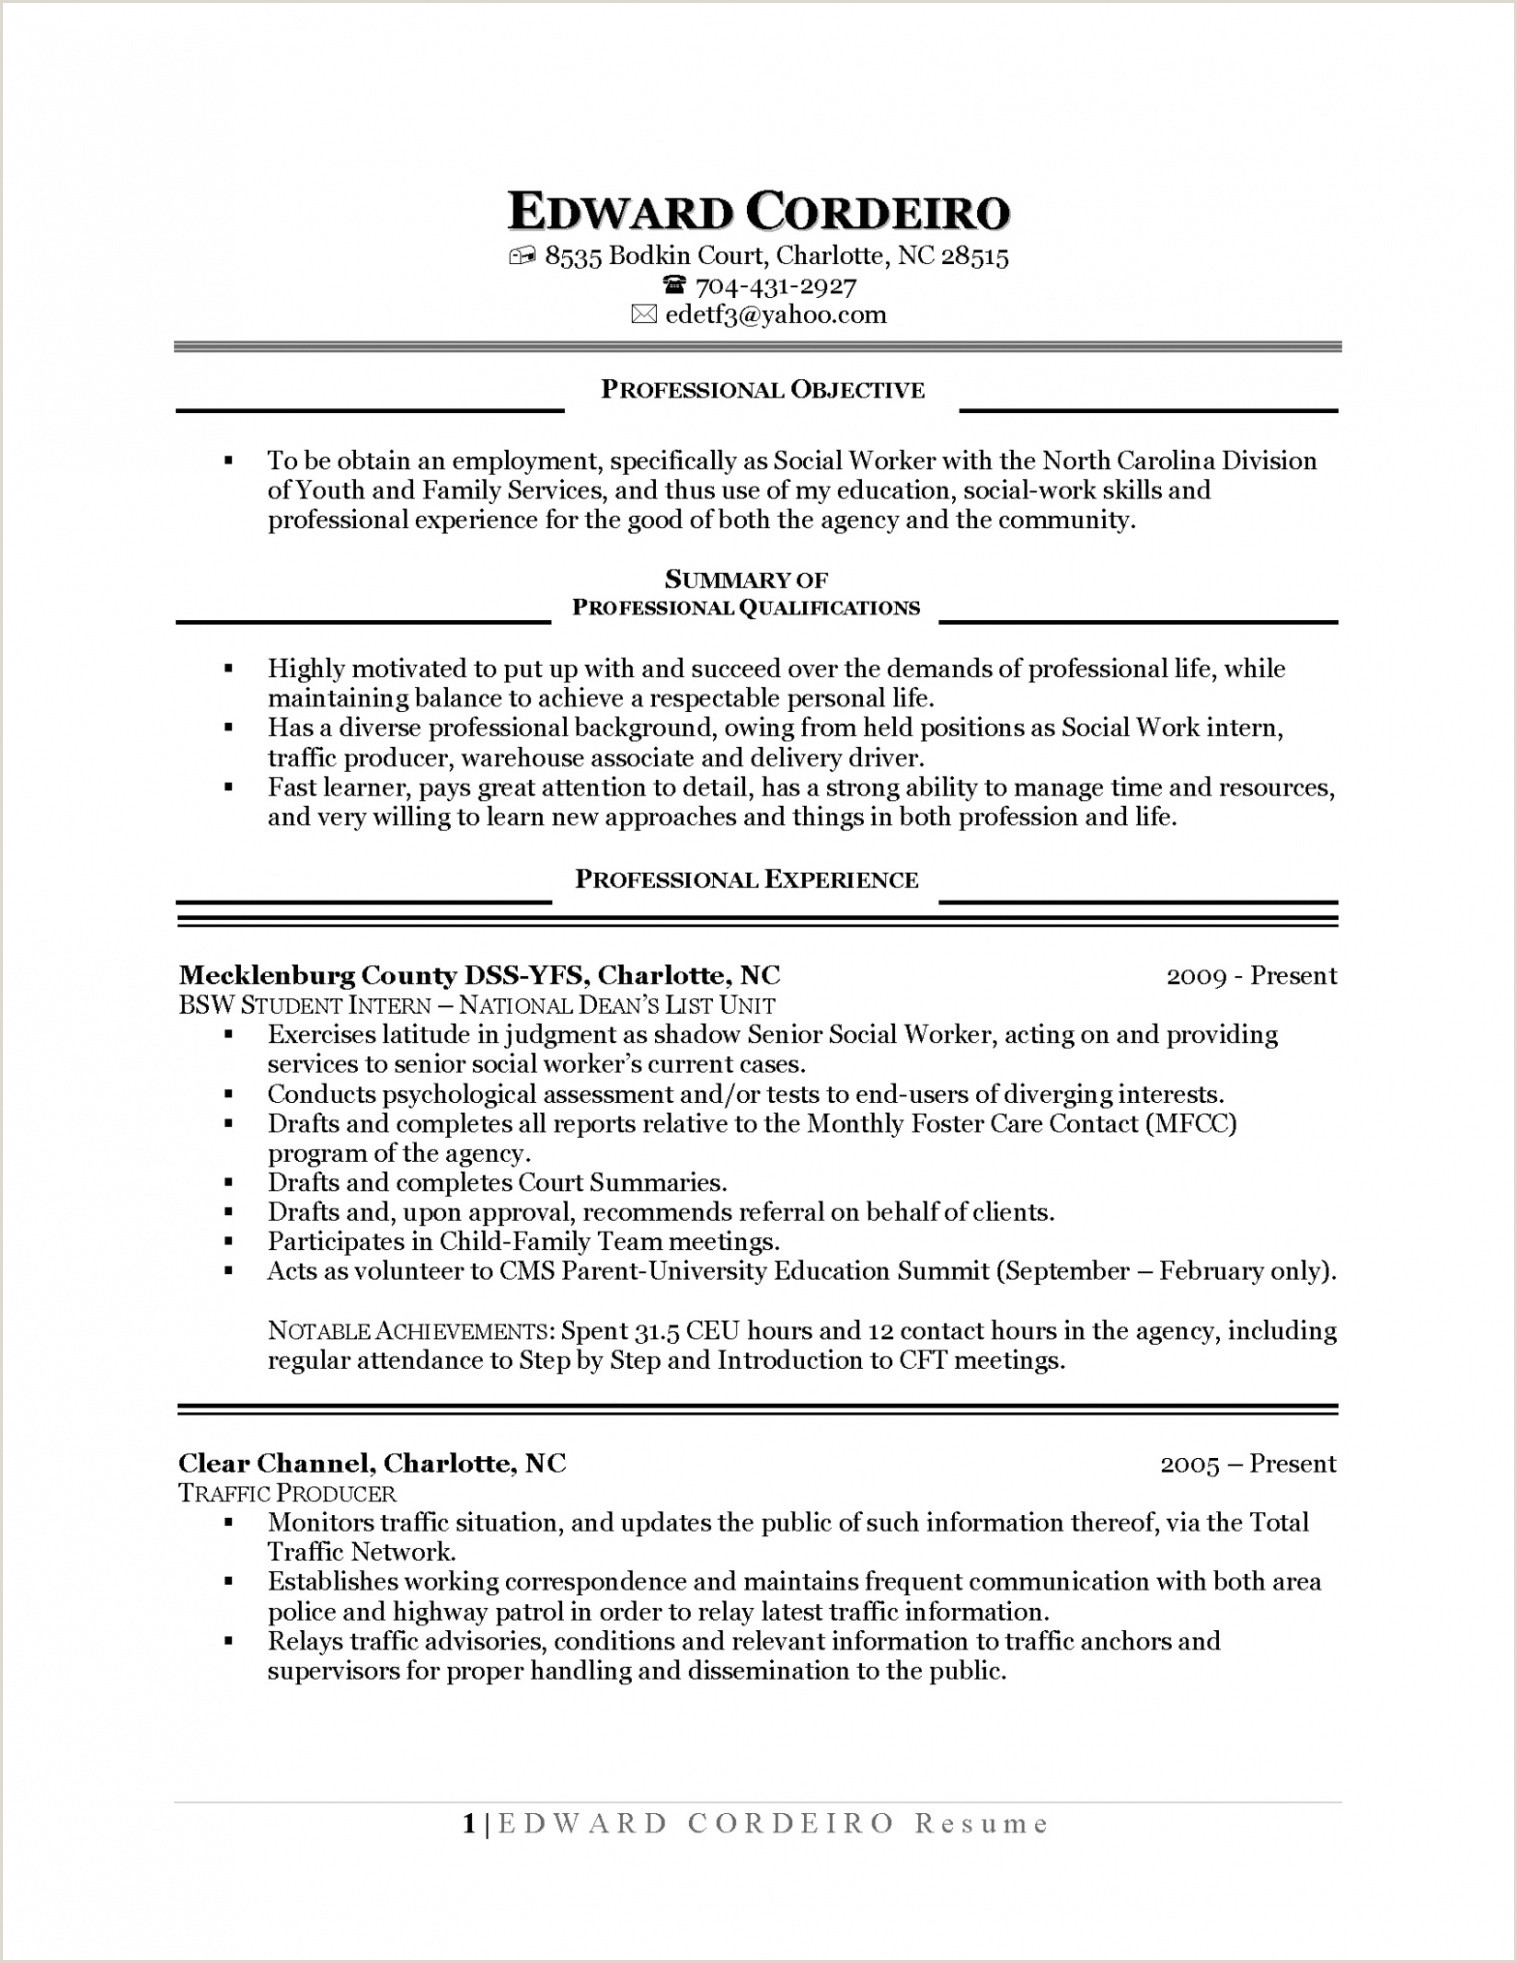 Objective for Internship Resume Sierra De Mesa — Psicologiaymediacion